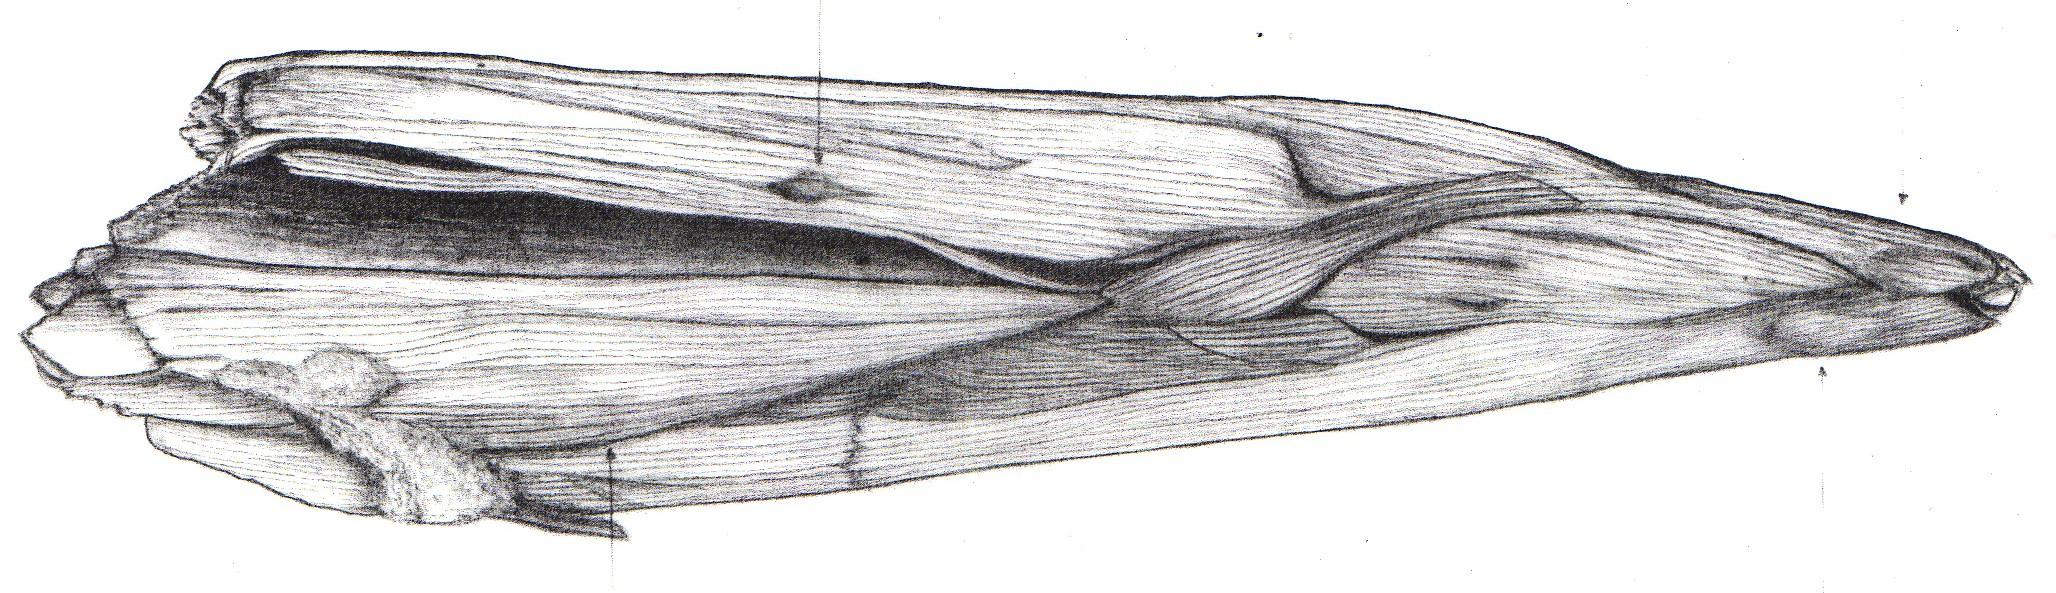 Bronze age - wooden stake Fulacht Fia (3